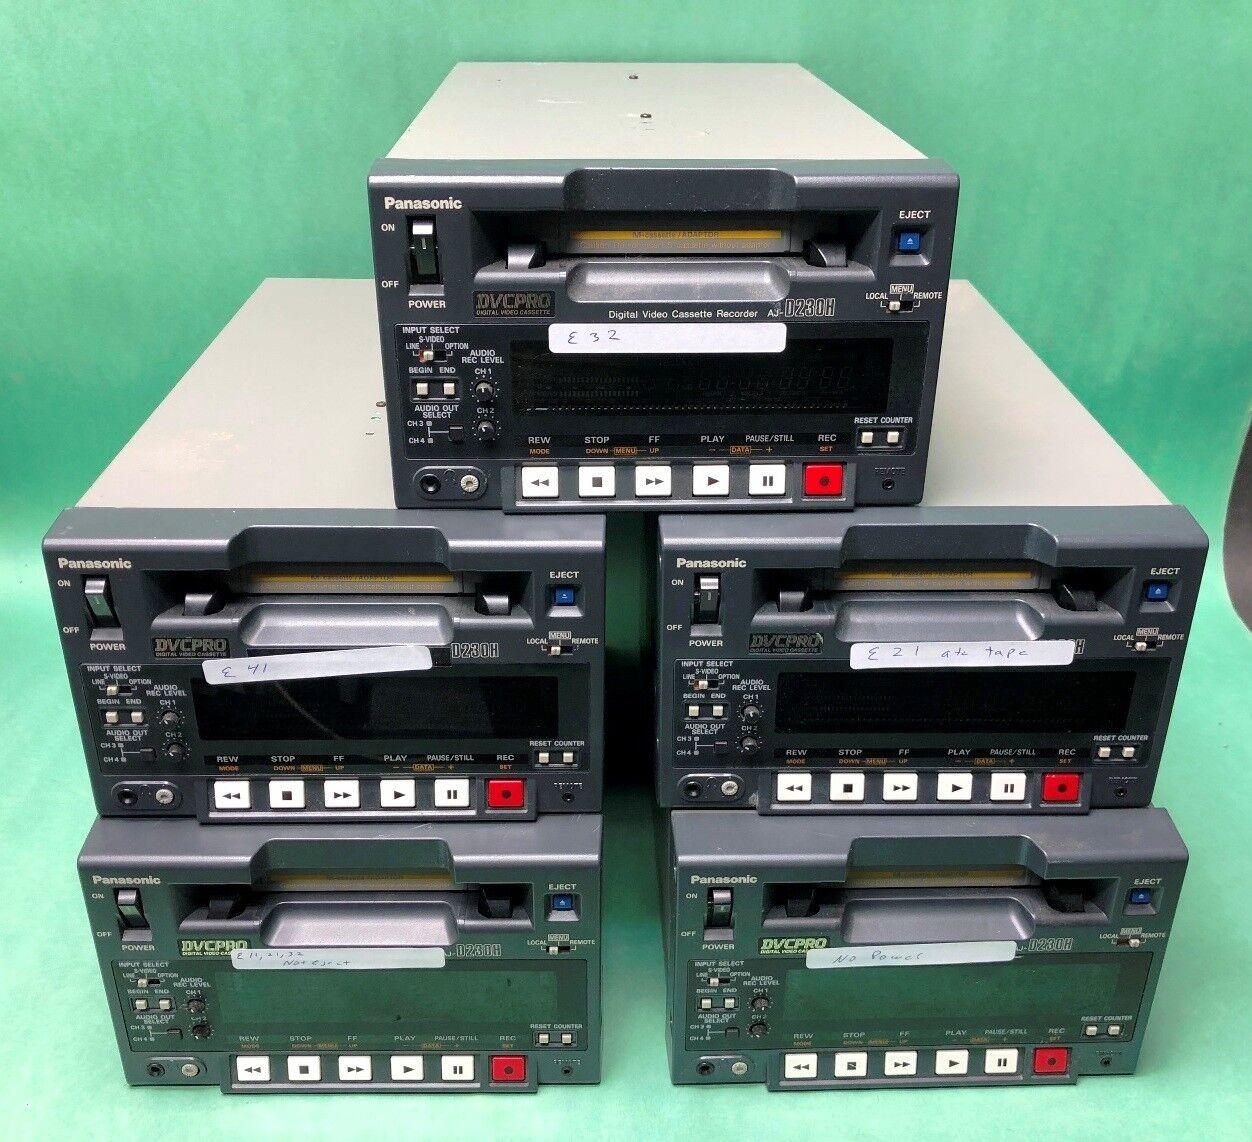 Lot 5 Panasonic DVCPRO Digital Video Cassette Recorder AJ-D230H VCR Parts Repair